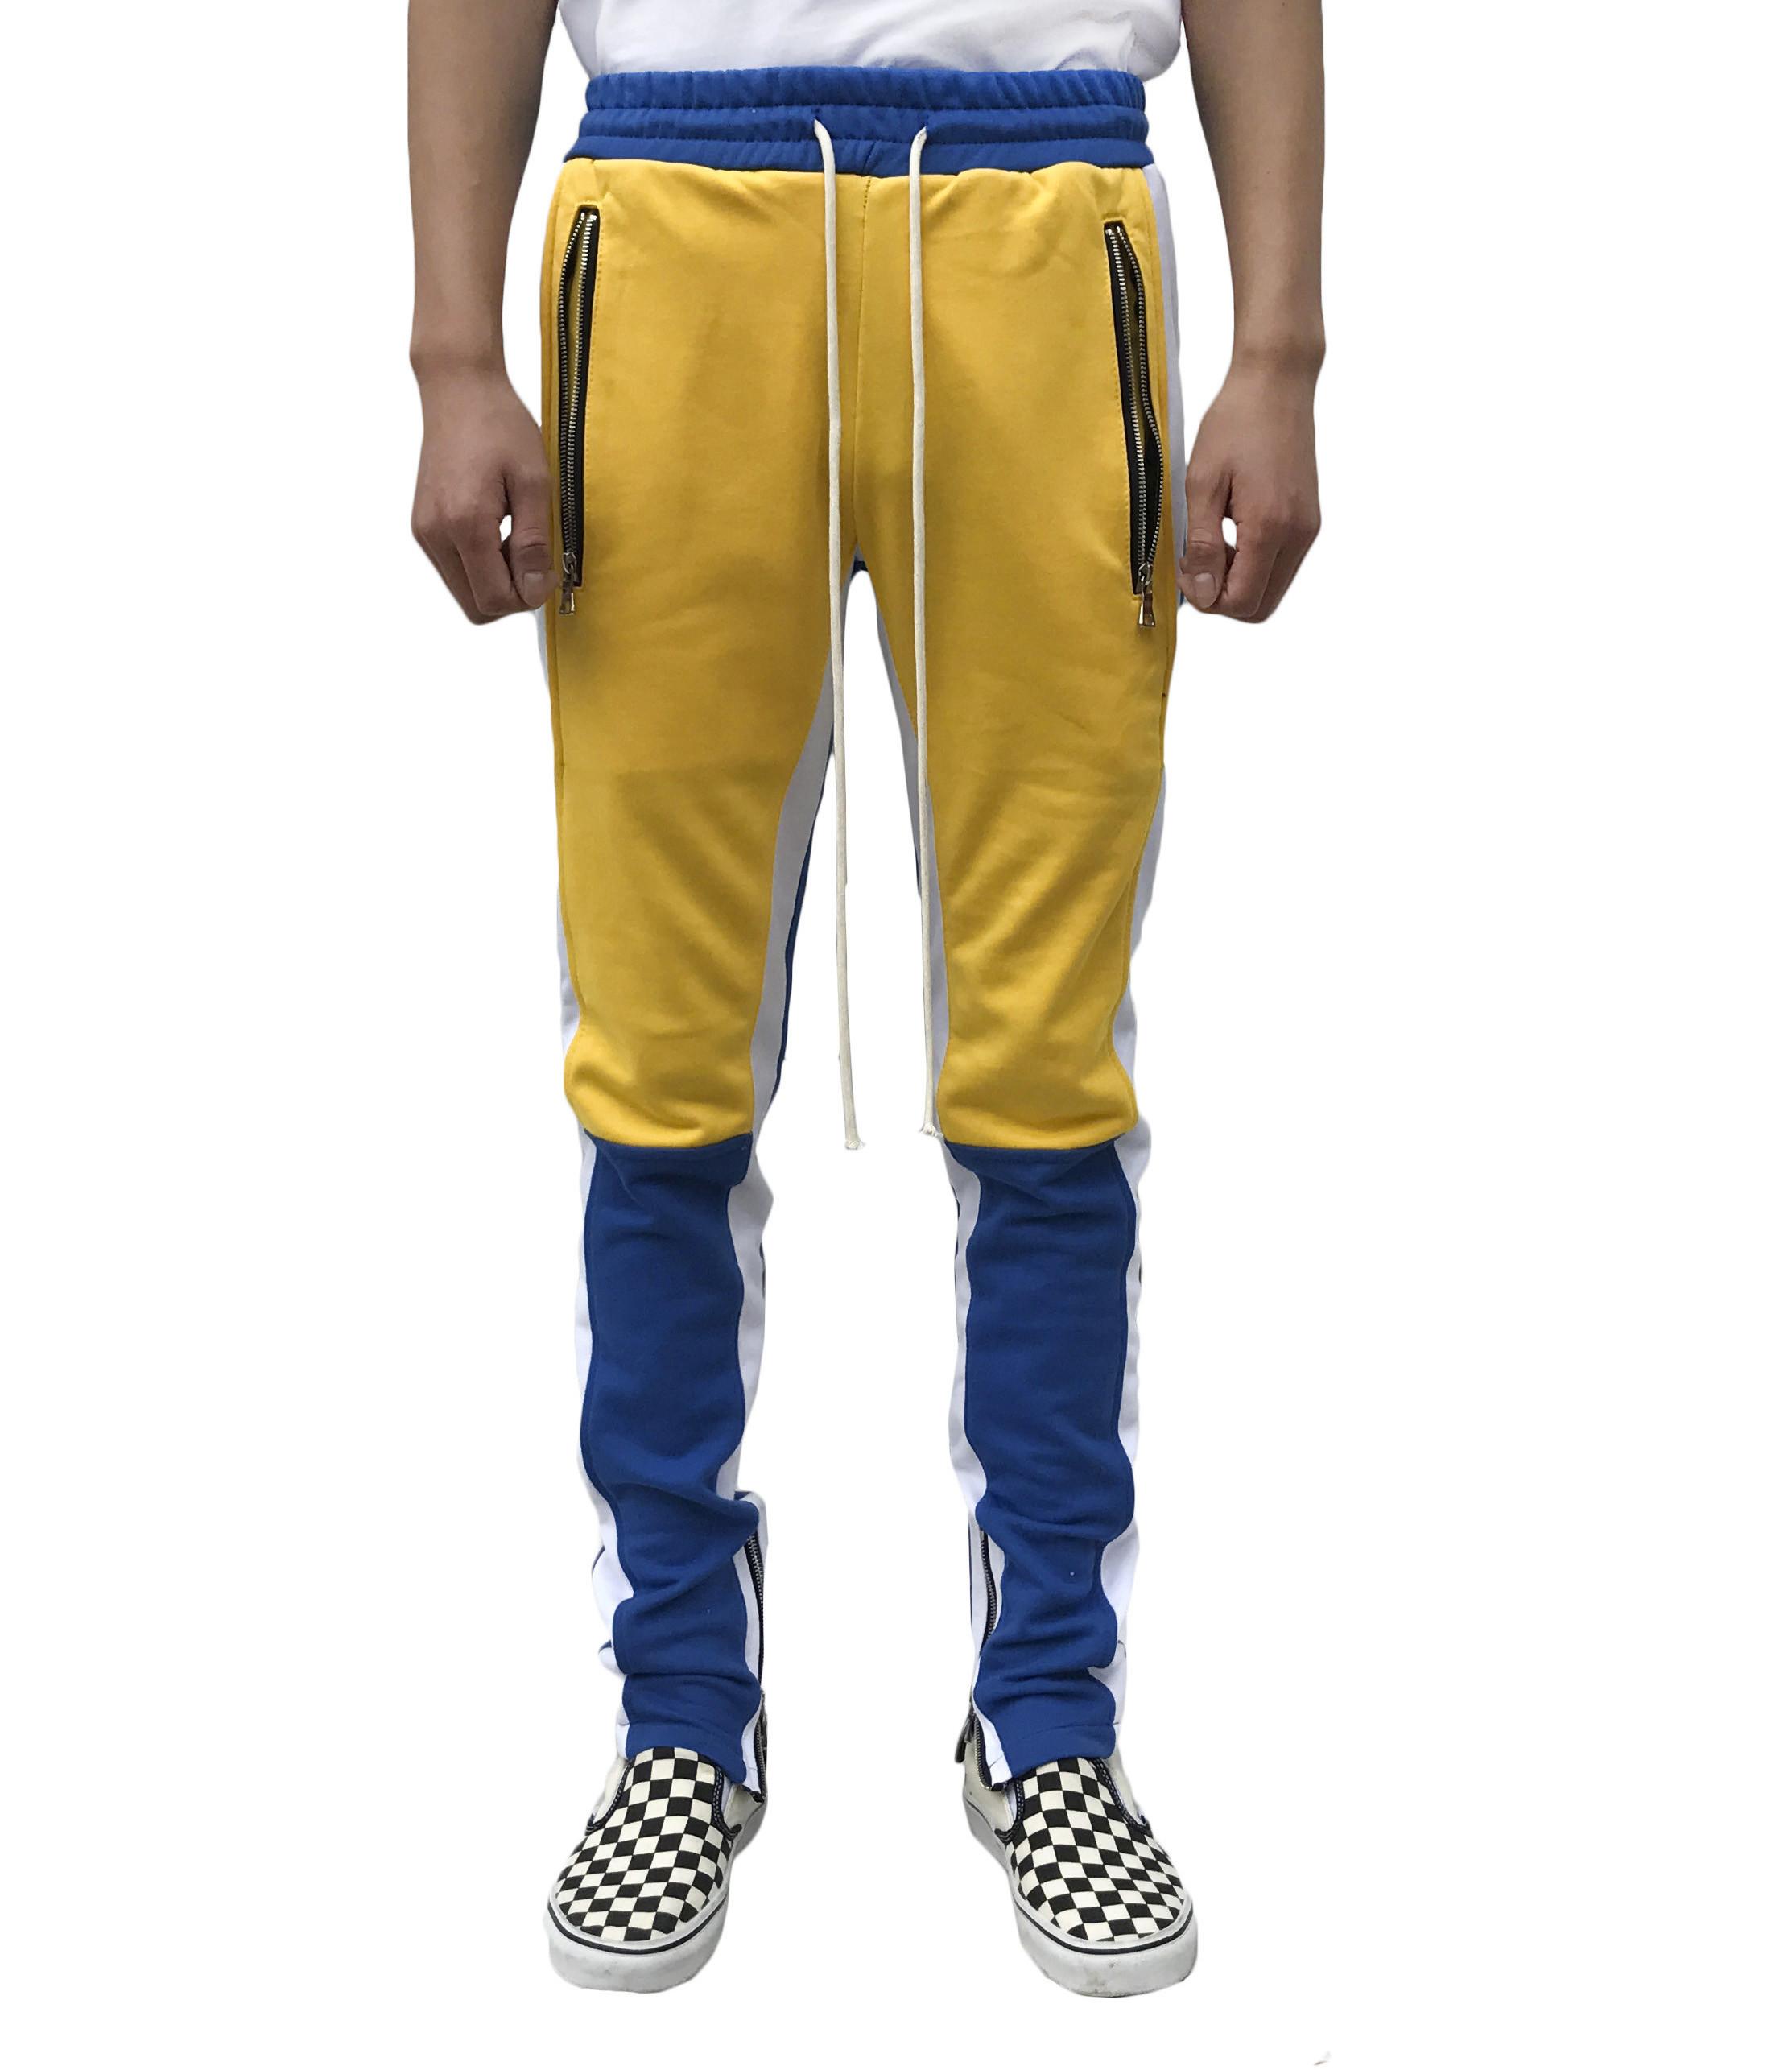 Motocross Track Pant -Blue/Yellow